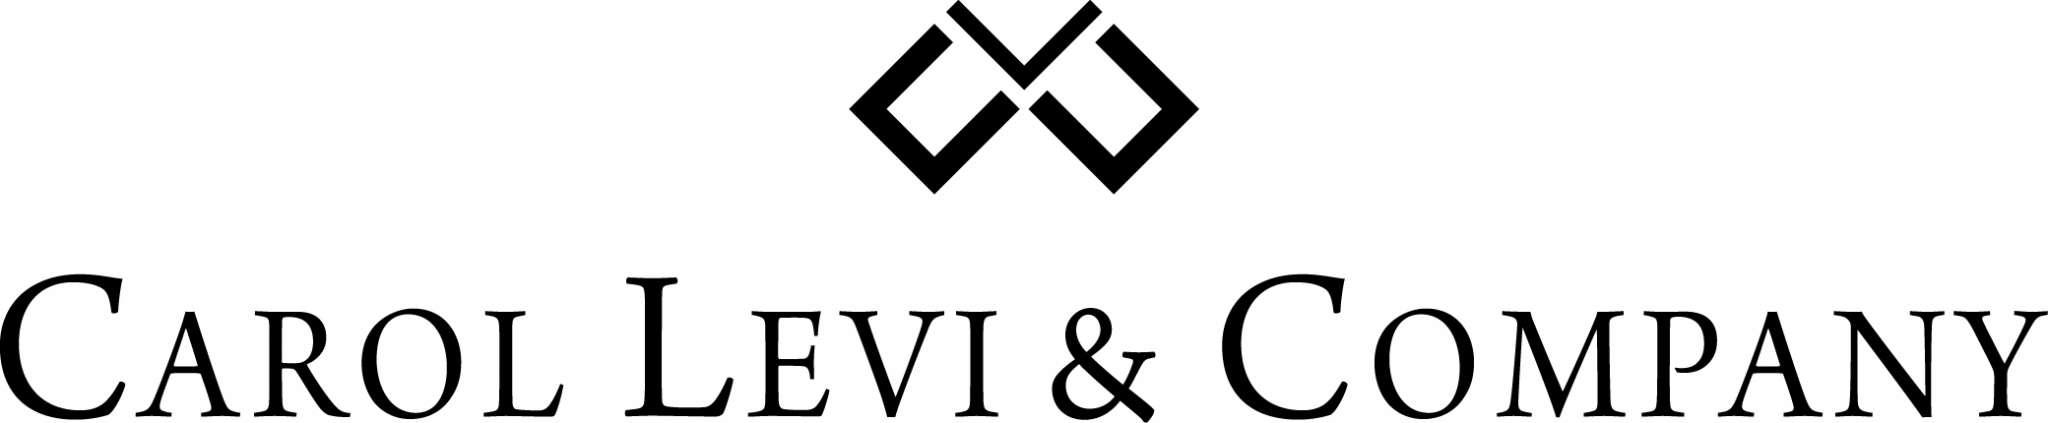 Carol Levi & Co.